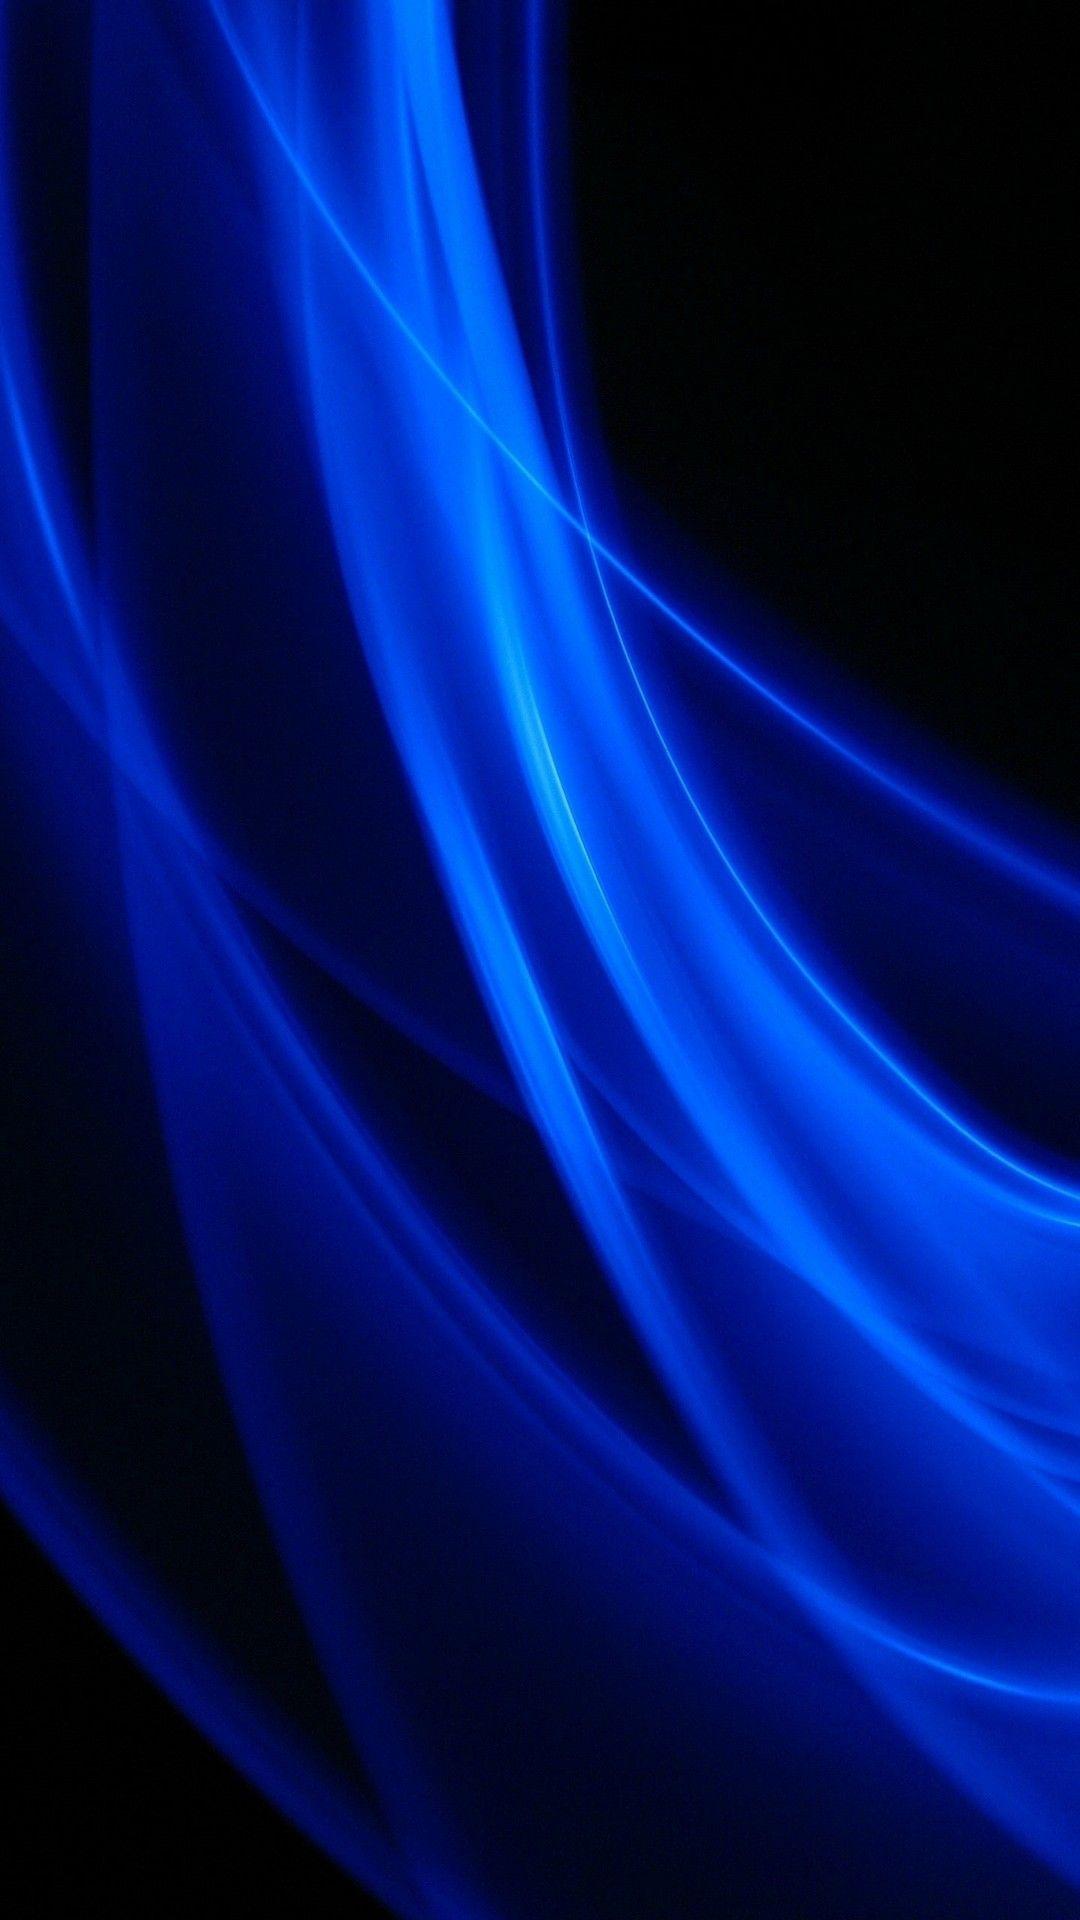 Dark Blue Wallpaper For iPhone | Beautiful Blues | Dark blue wallpaper, Blue wallpaper iphone ...